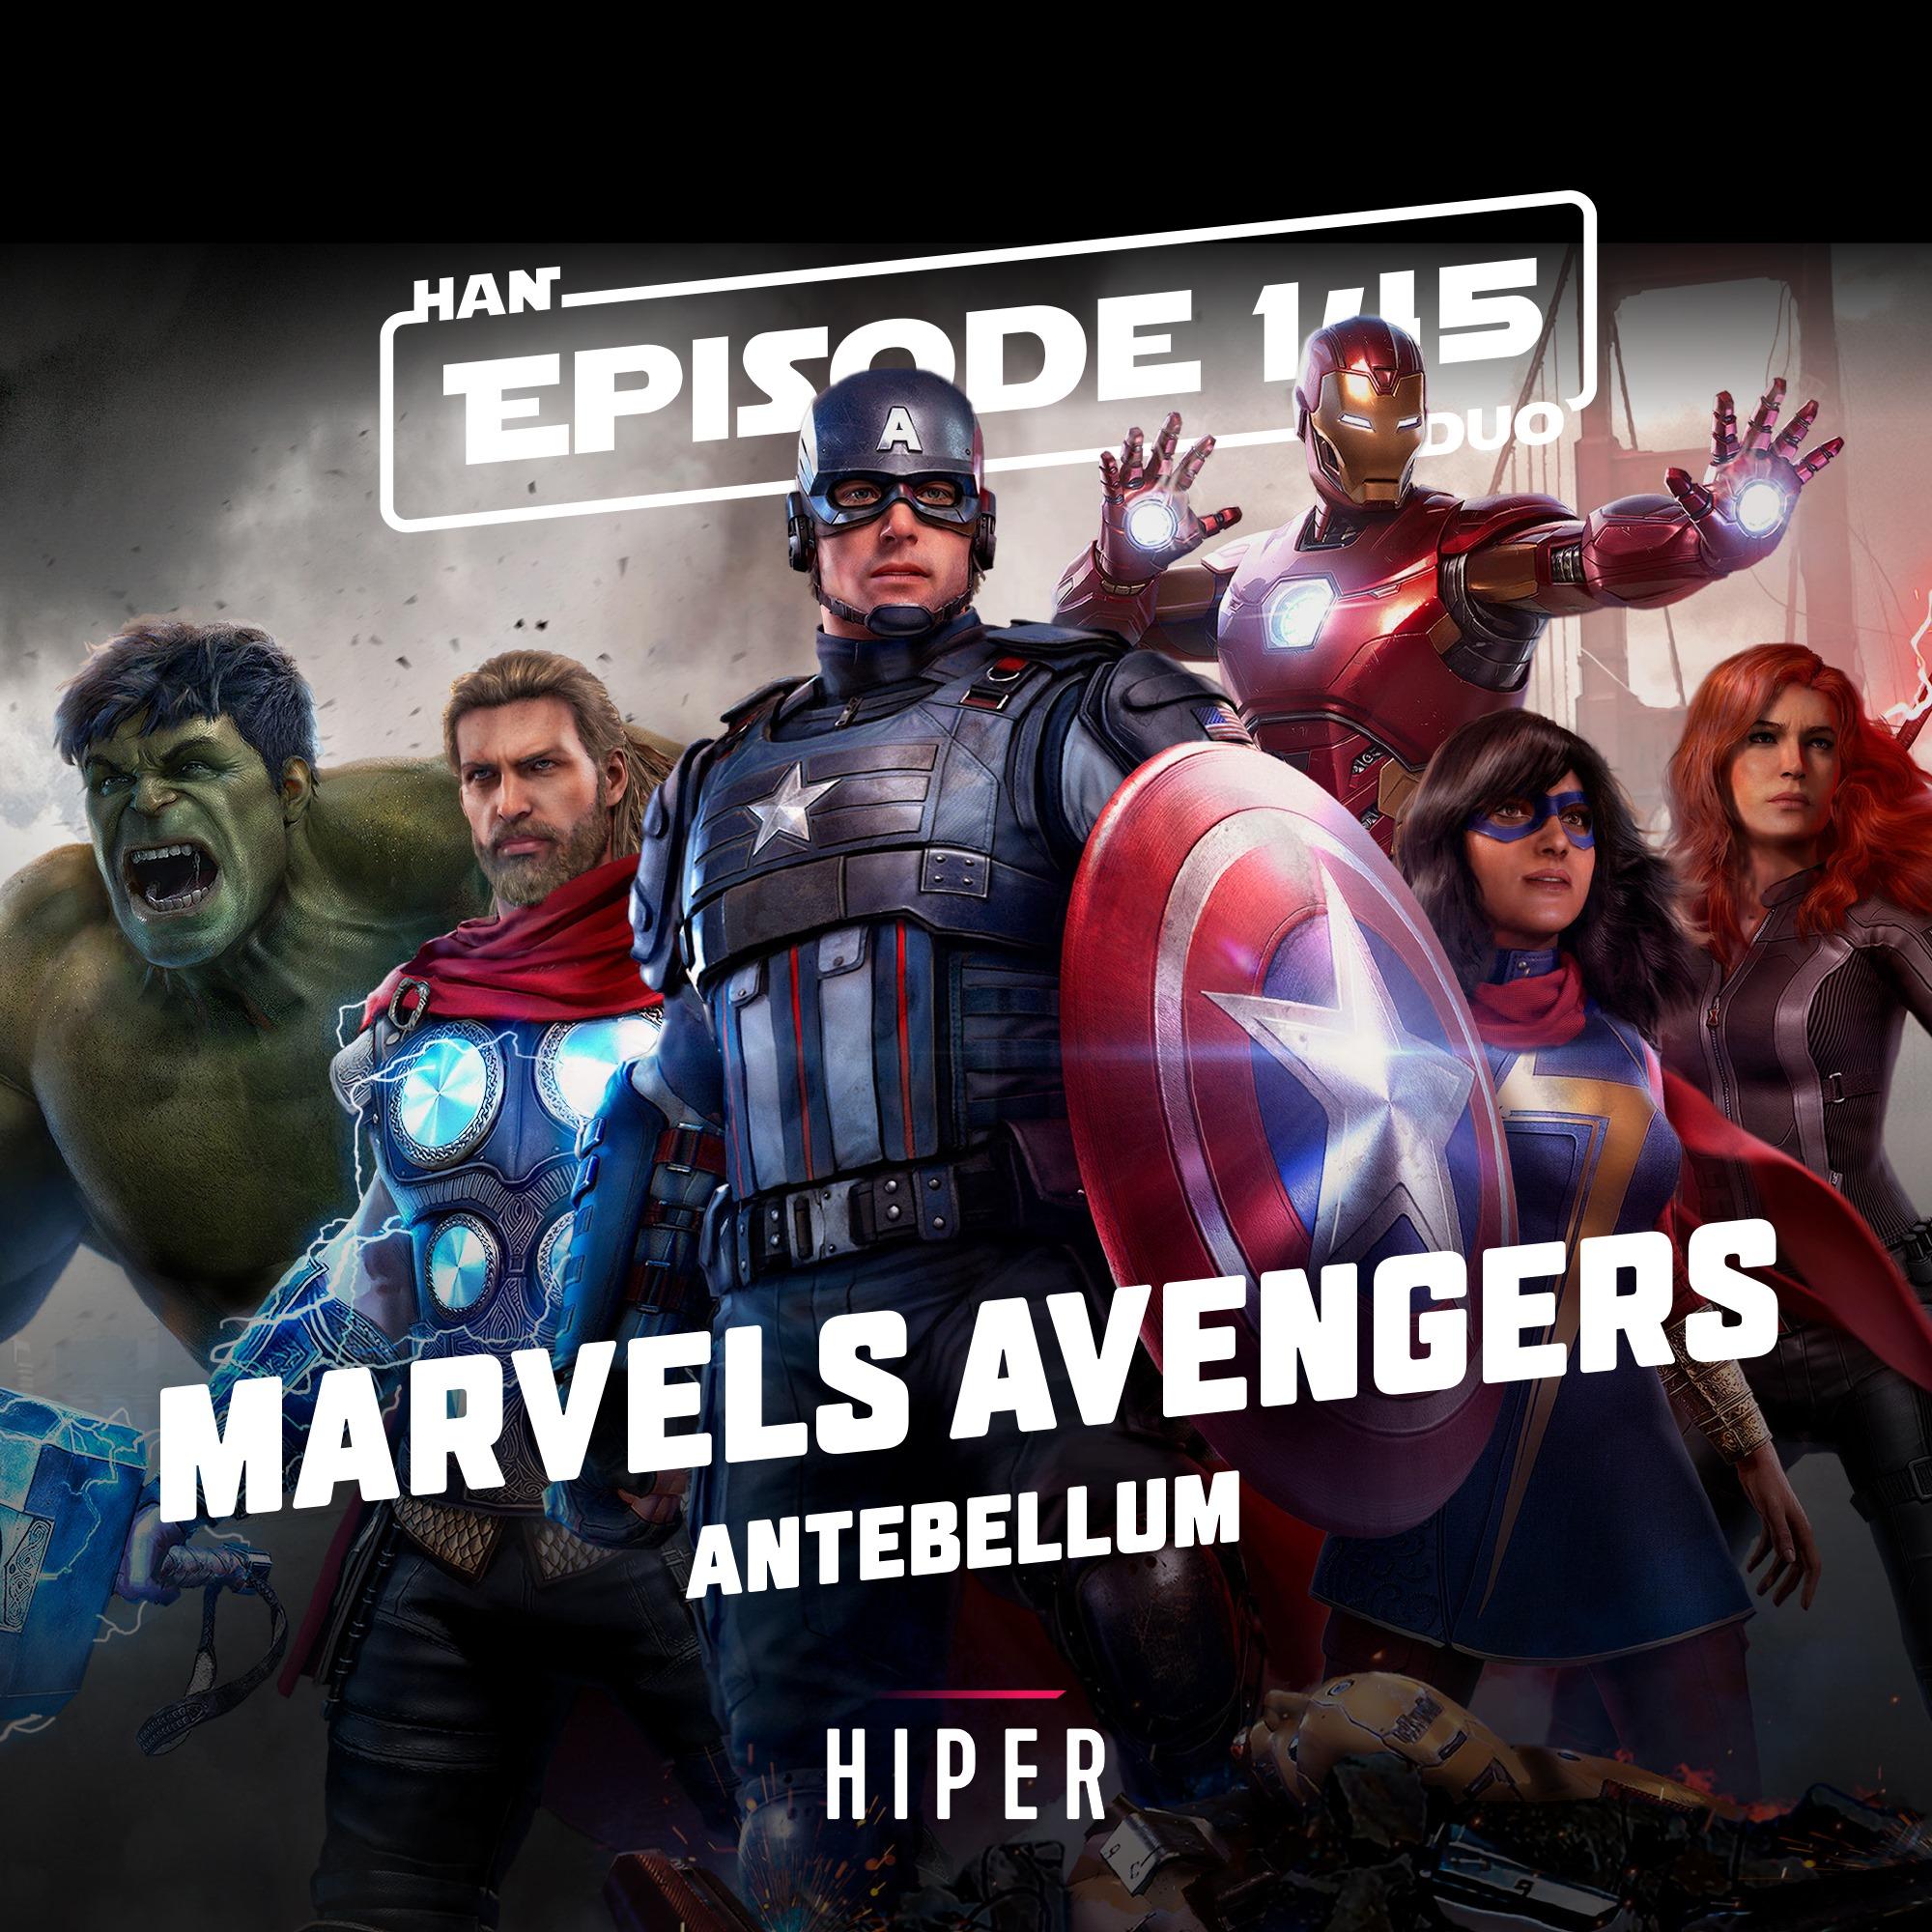 Han Duo #145: Marvels Avengers, Antebellum